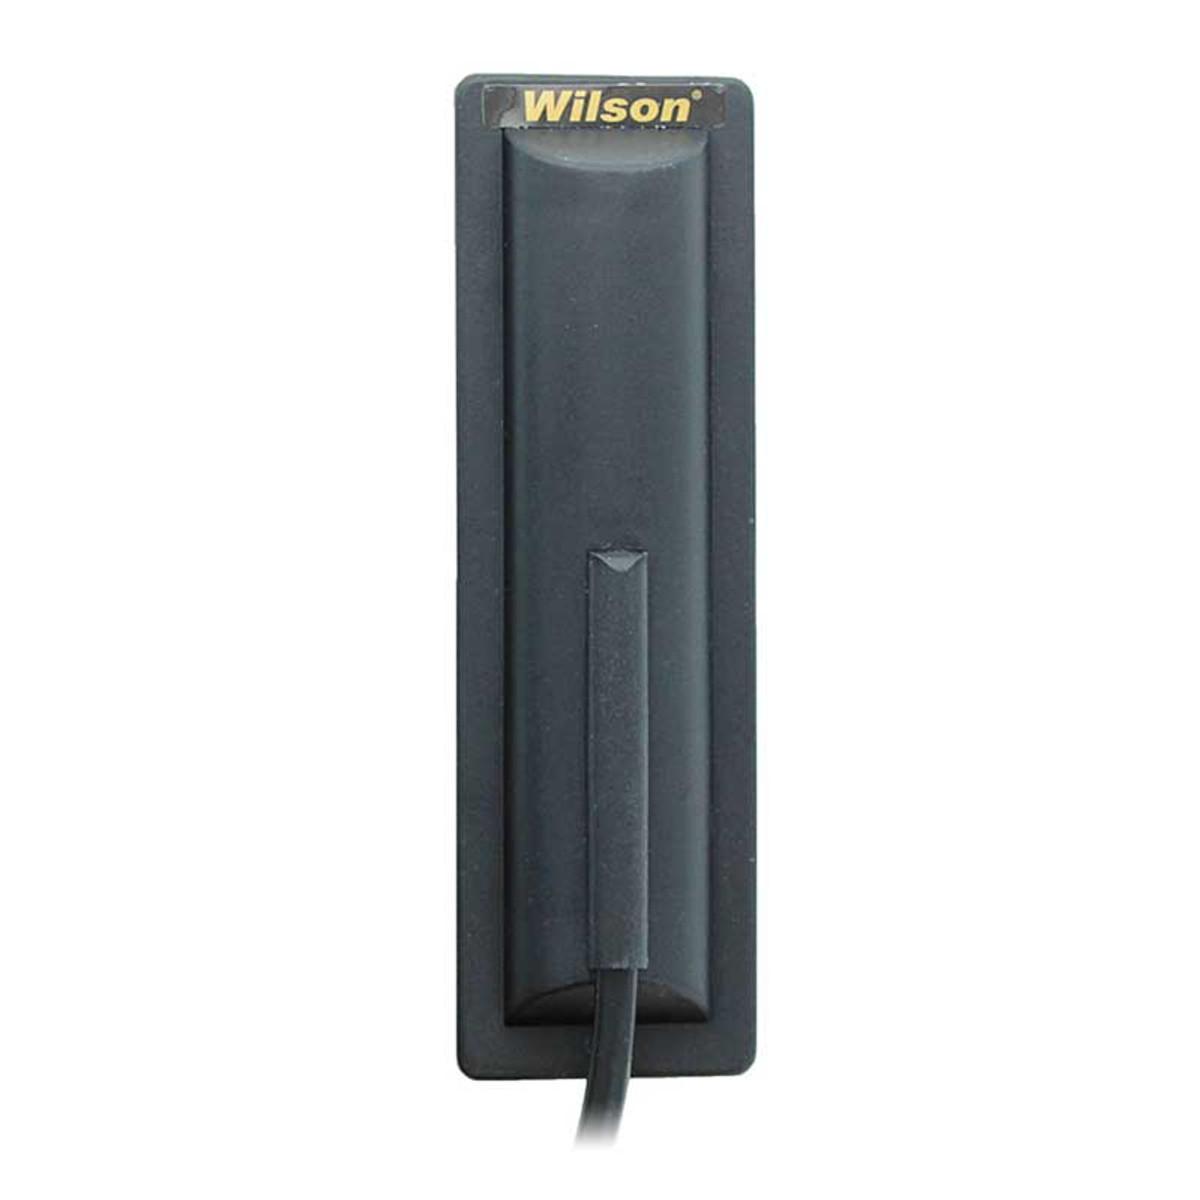 weBoost (Wilson) 311106 Low Profile Antenna SMA